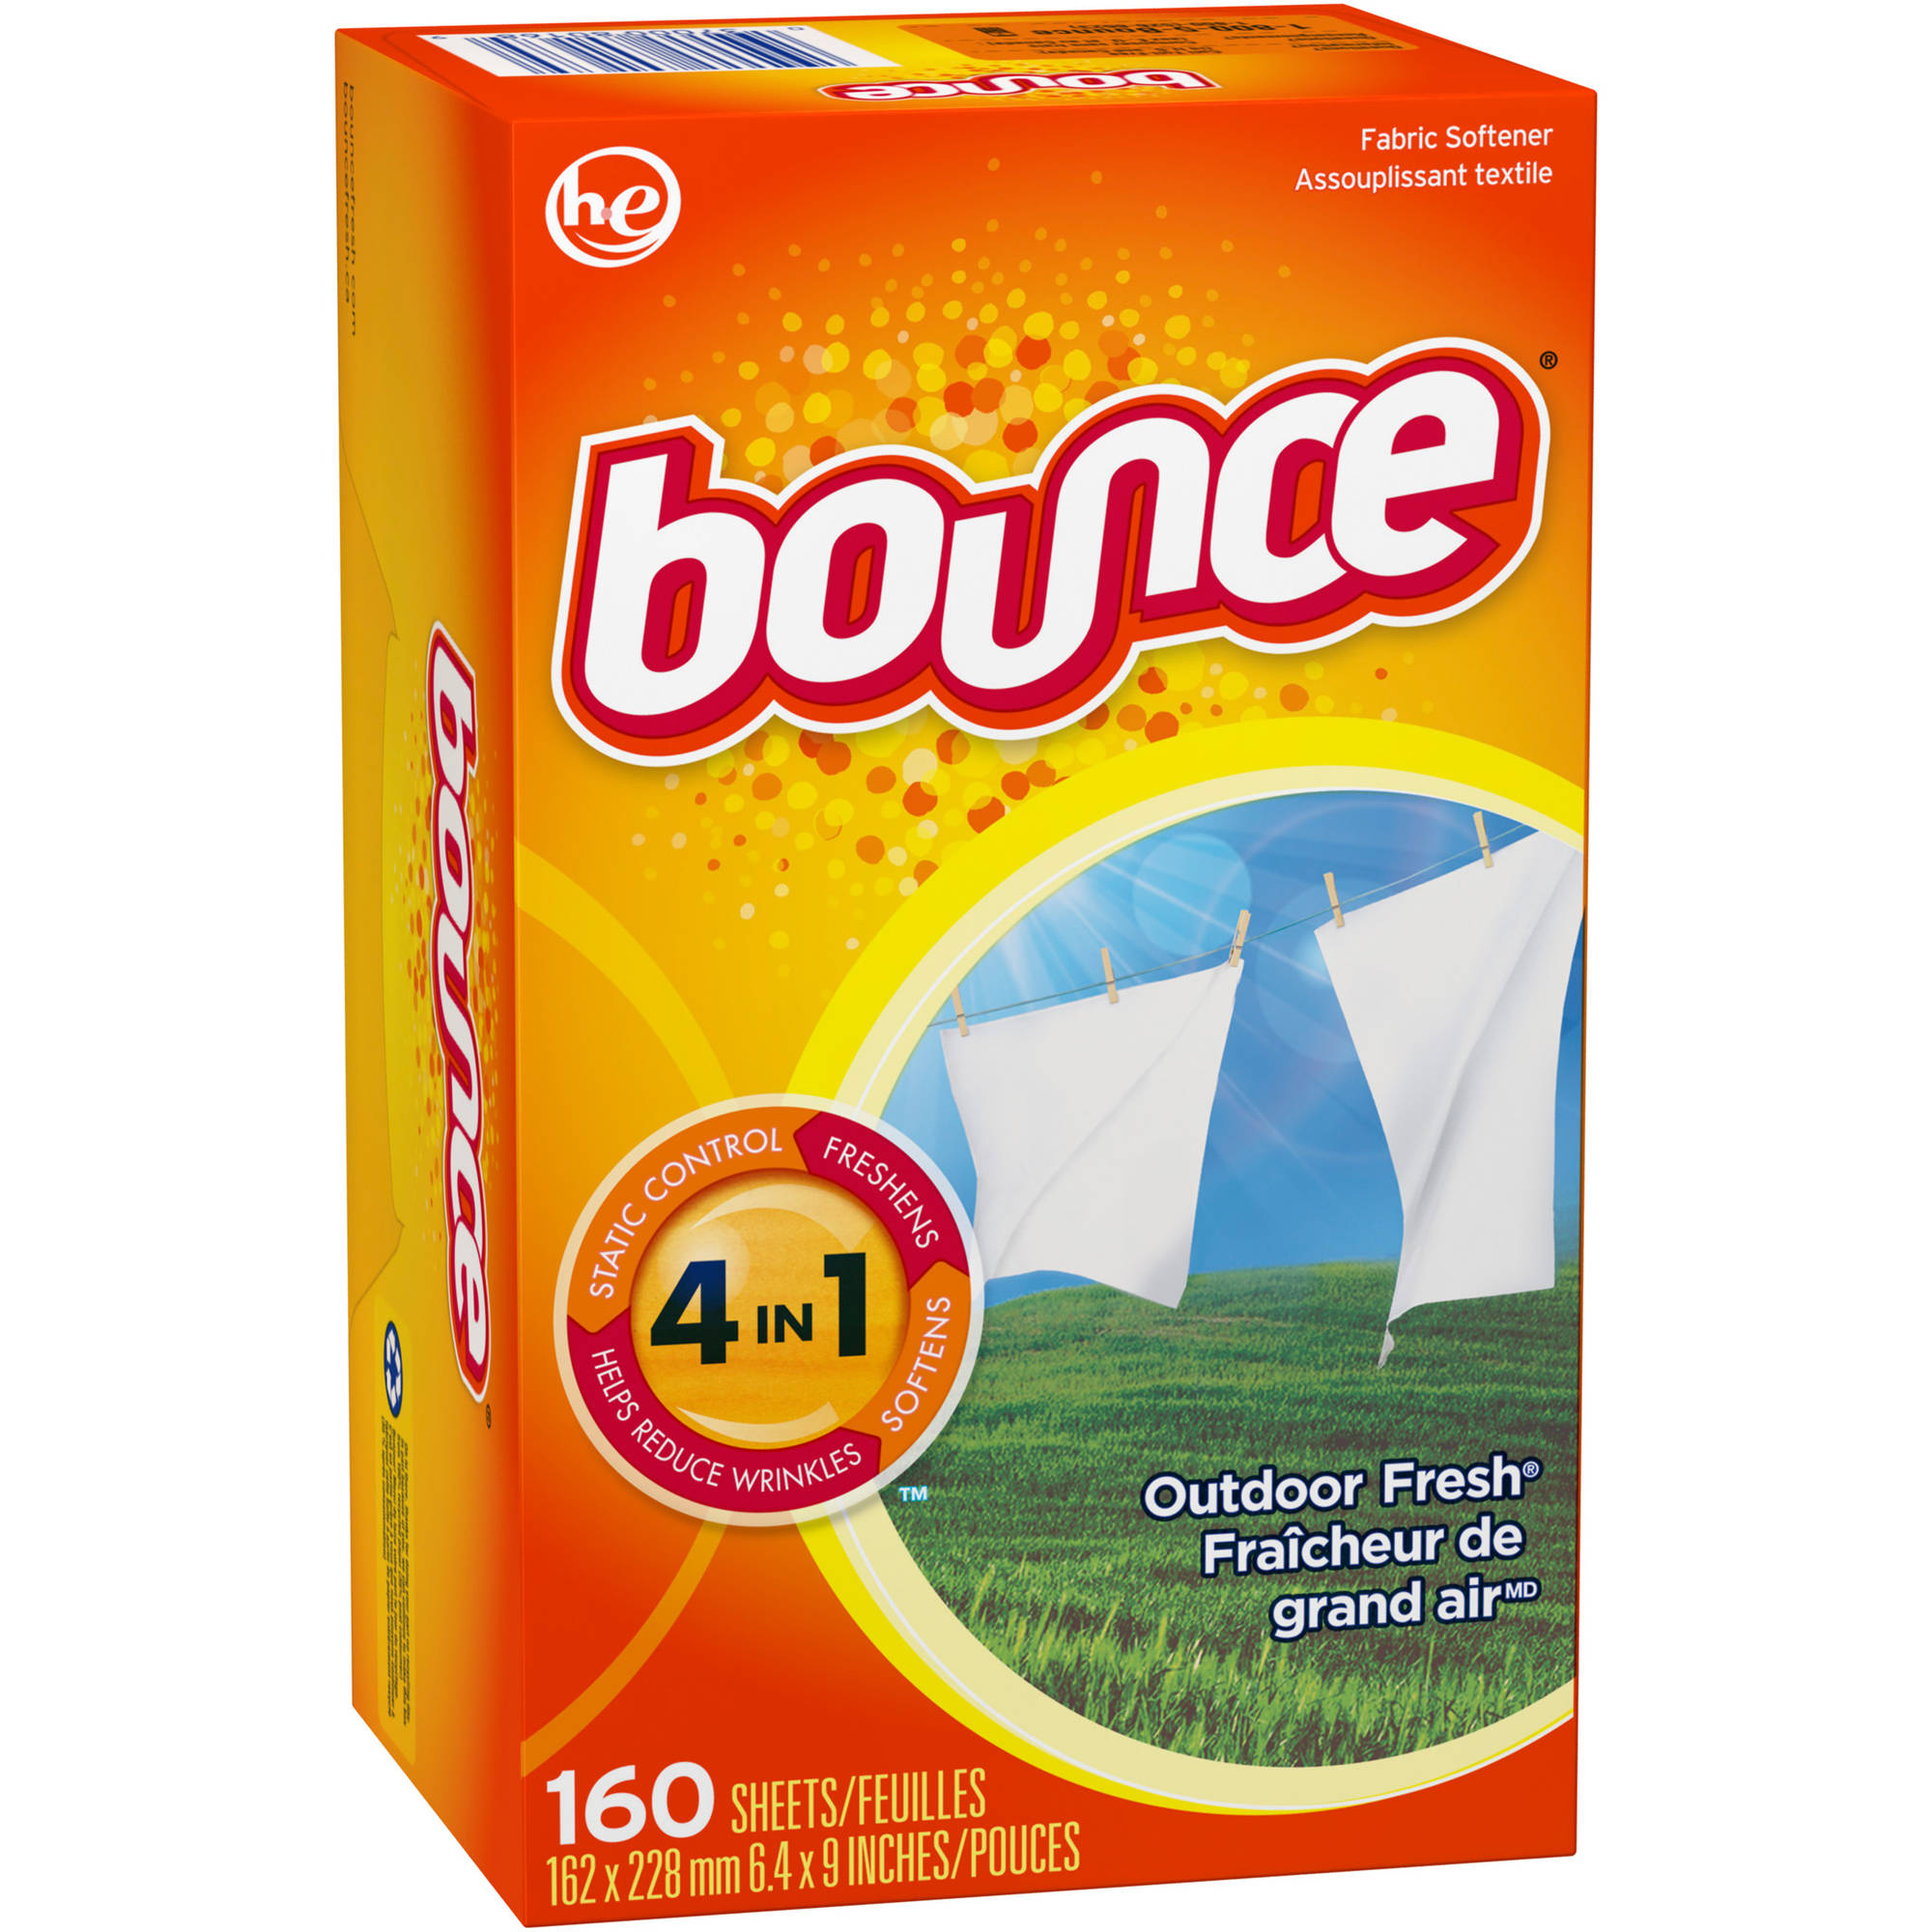 Bounce Outdoor Fresh Fabric Softener Sheets, 160 sheets